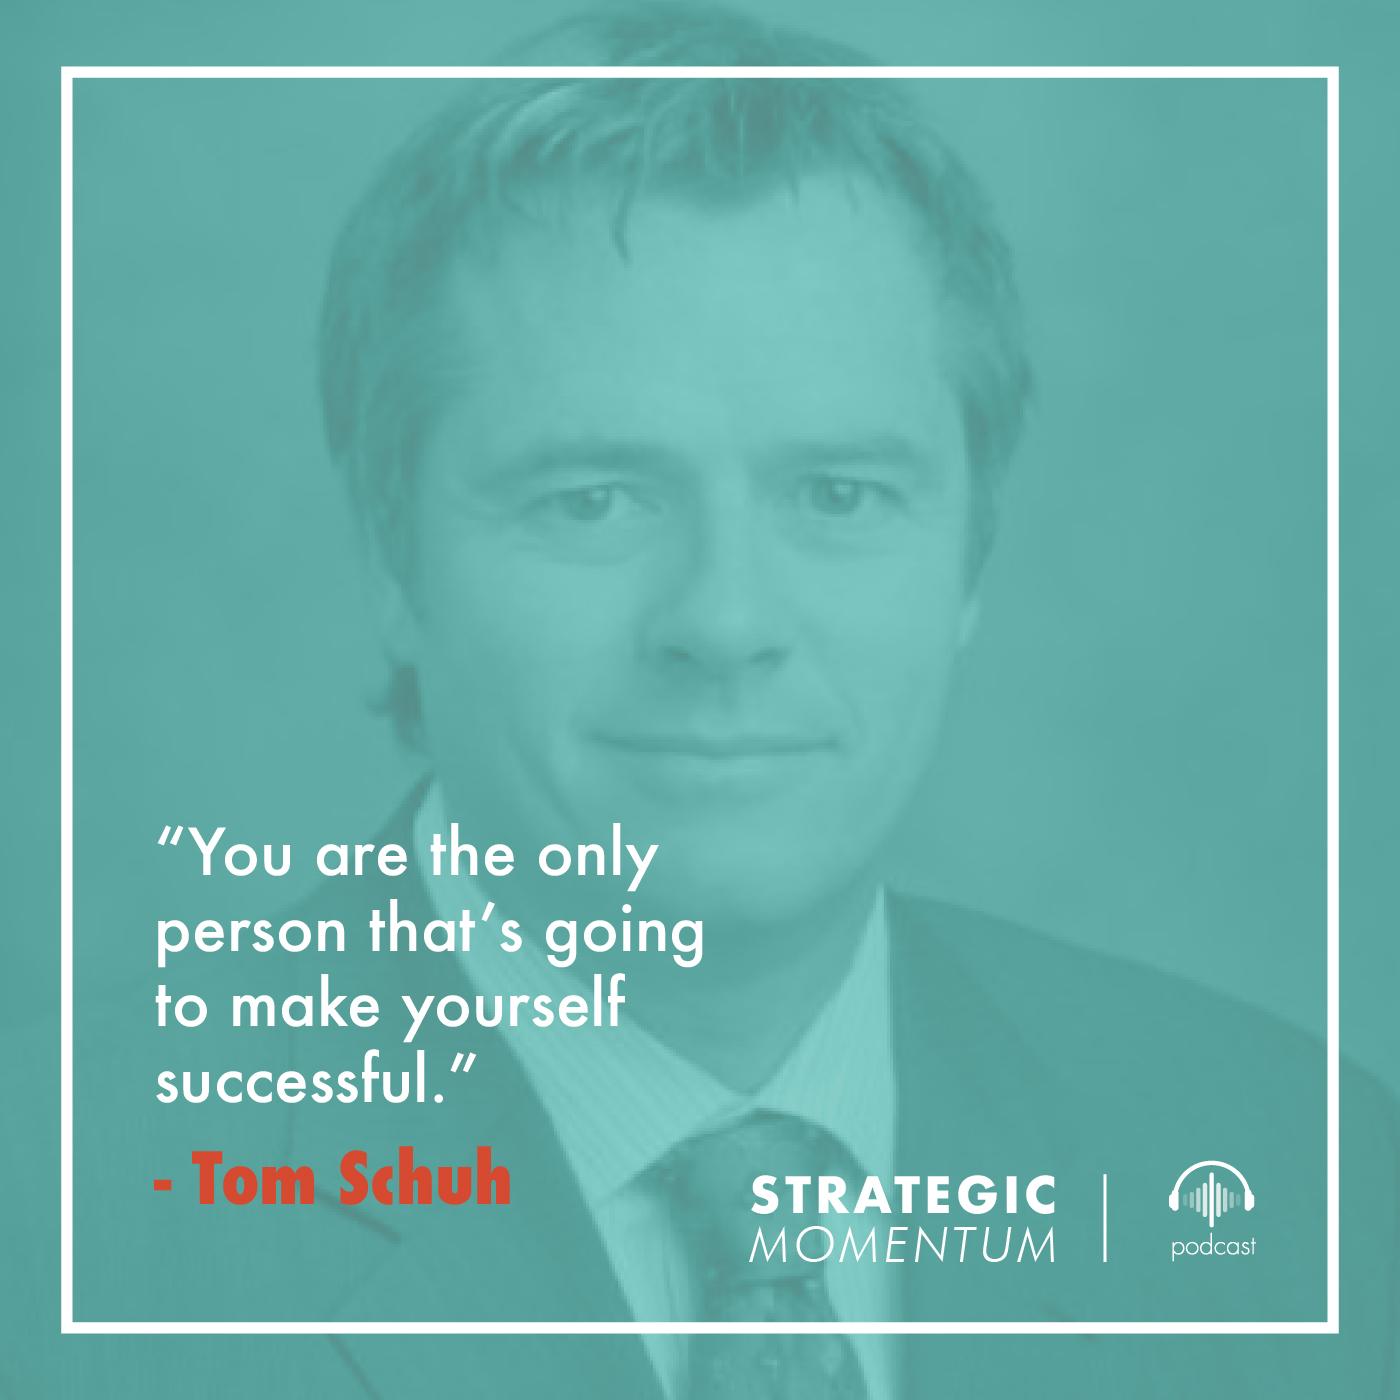 Tom Schuh Quote | Strategic Momentum Podcast